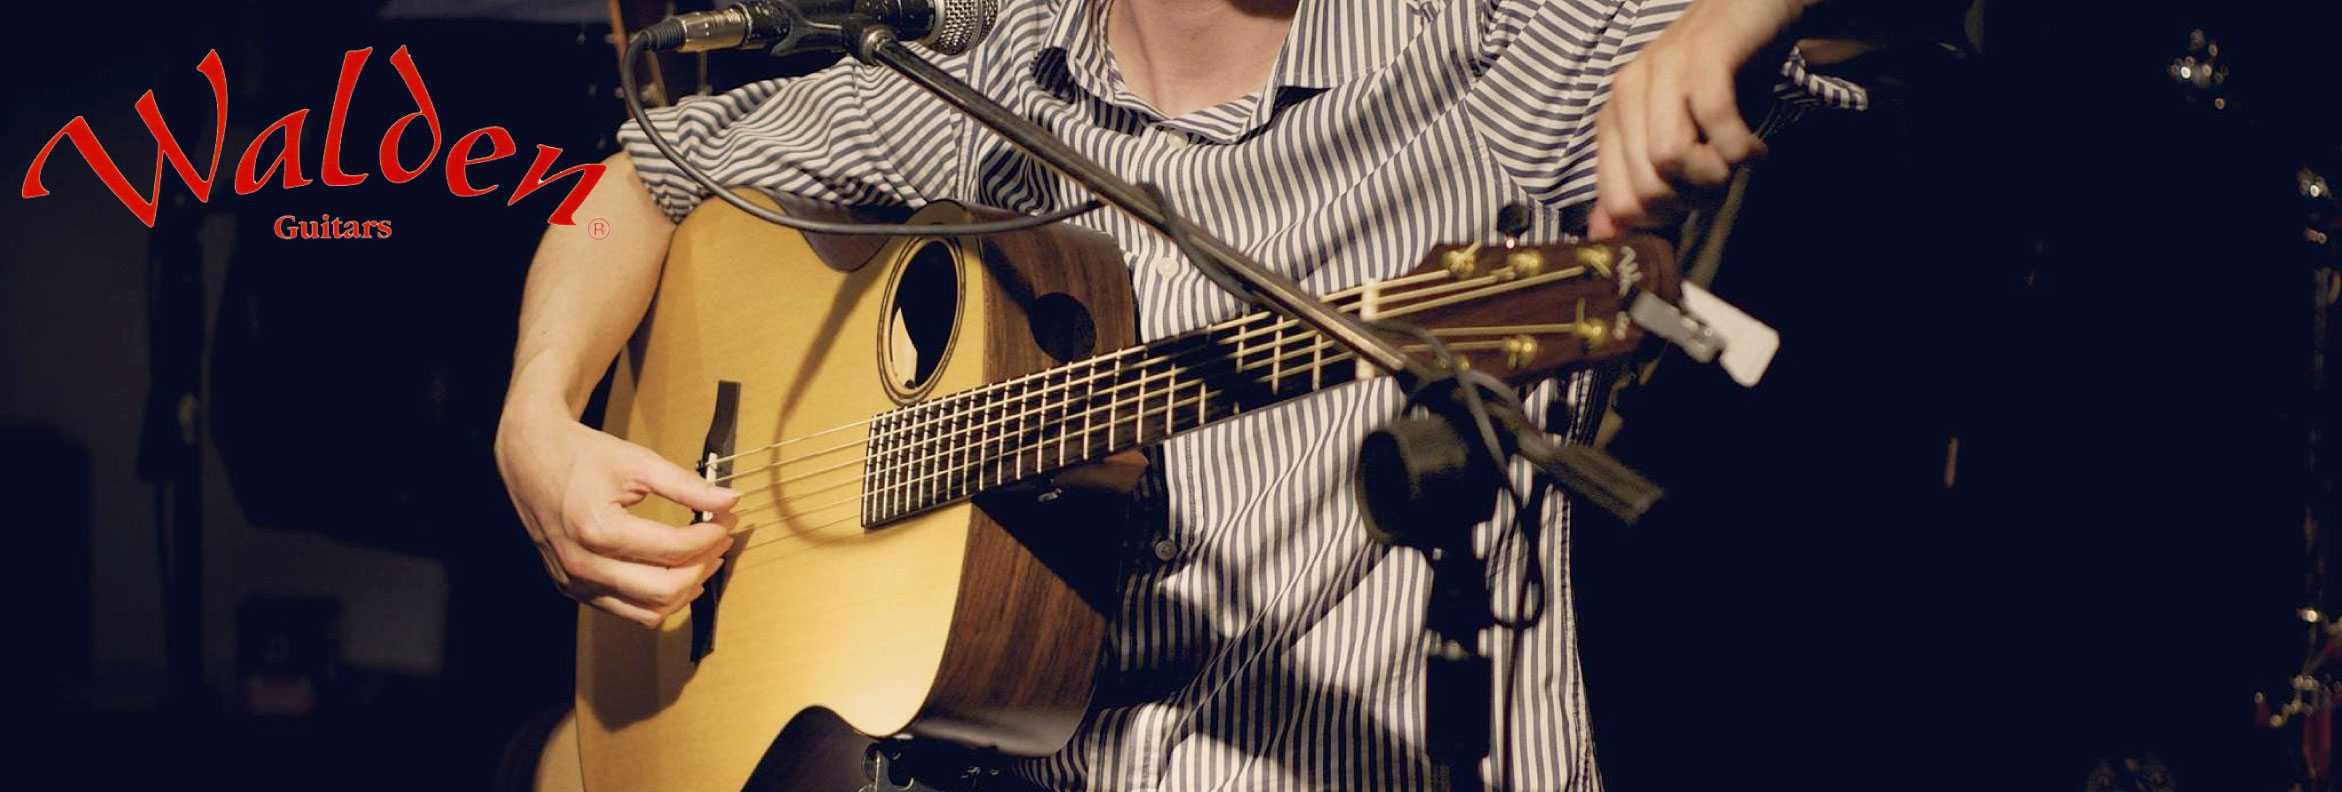 Walden Guitars